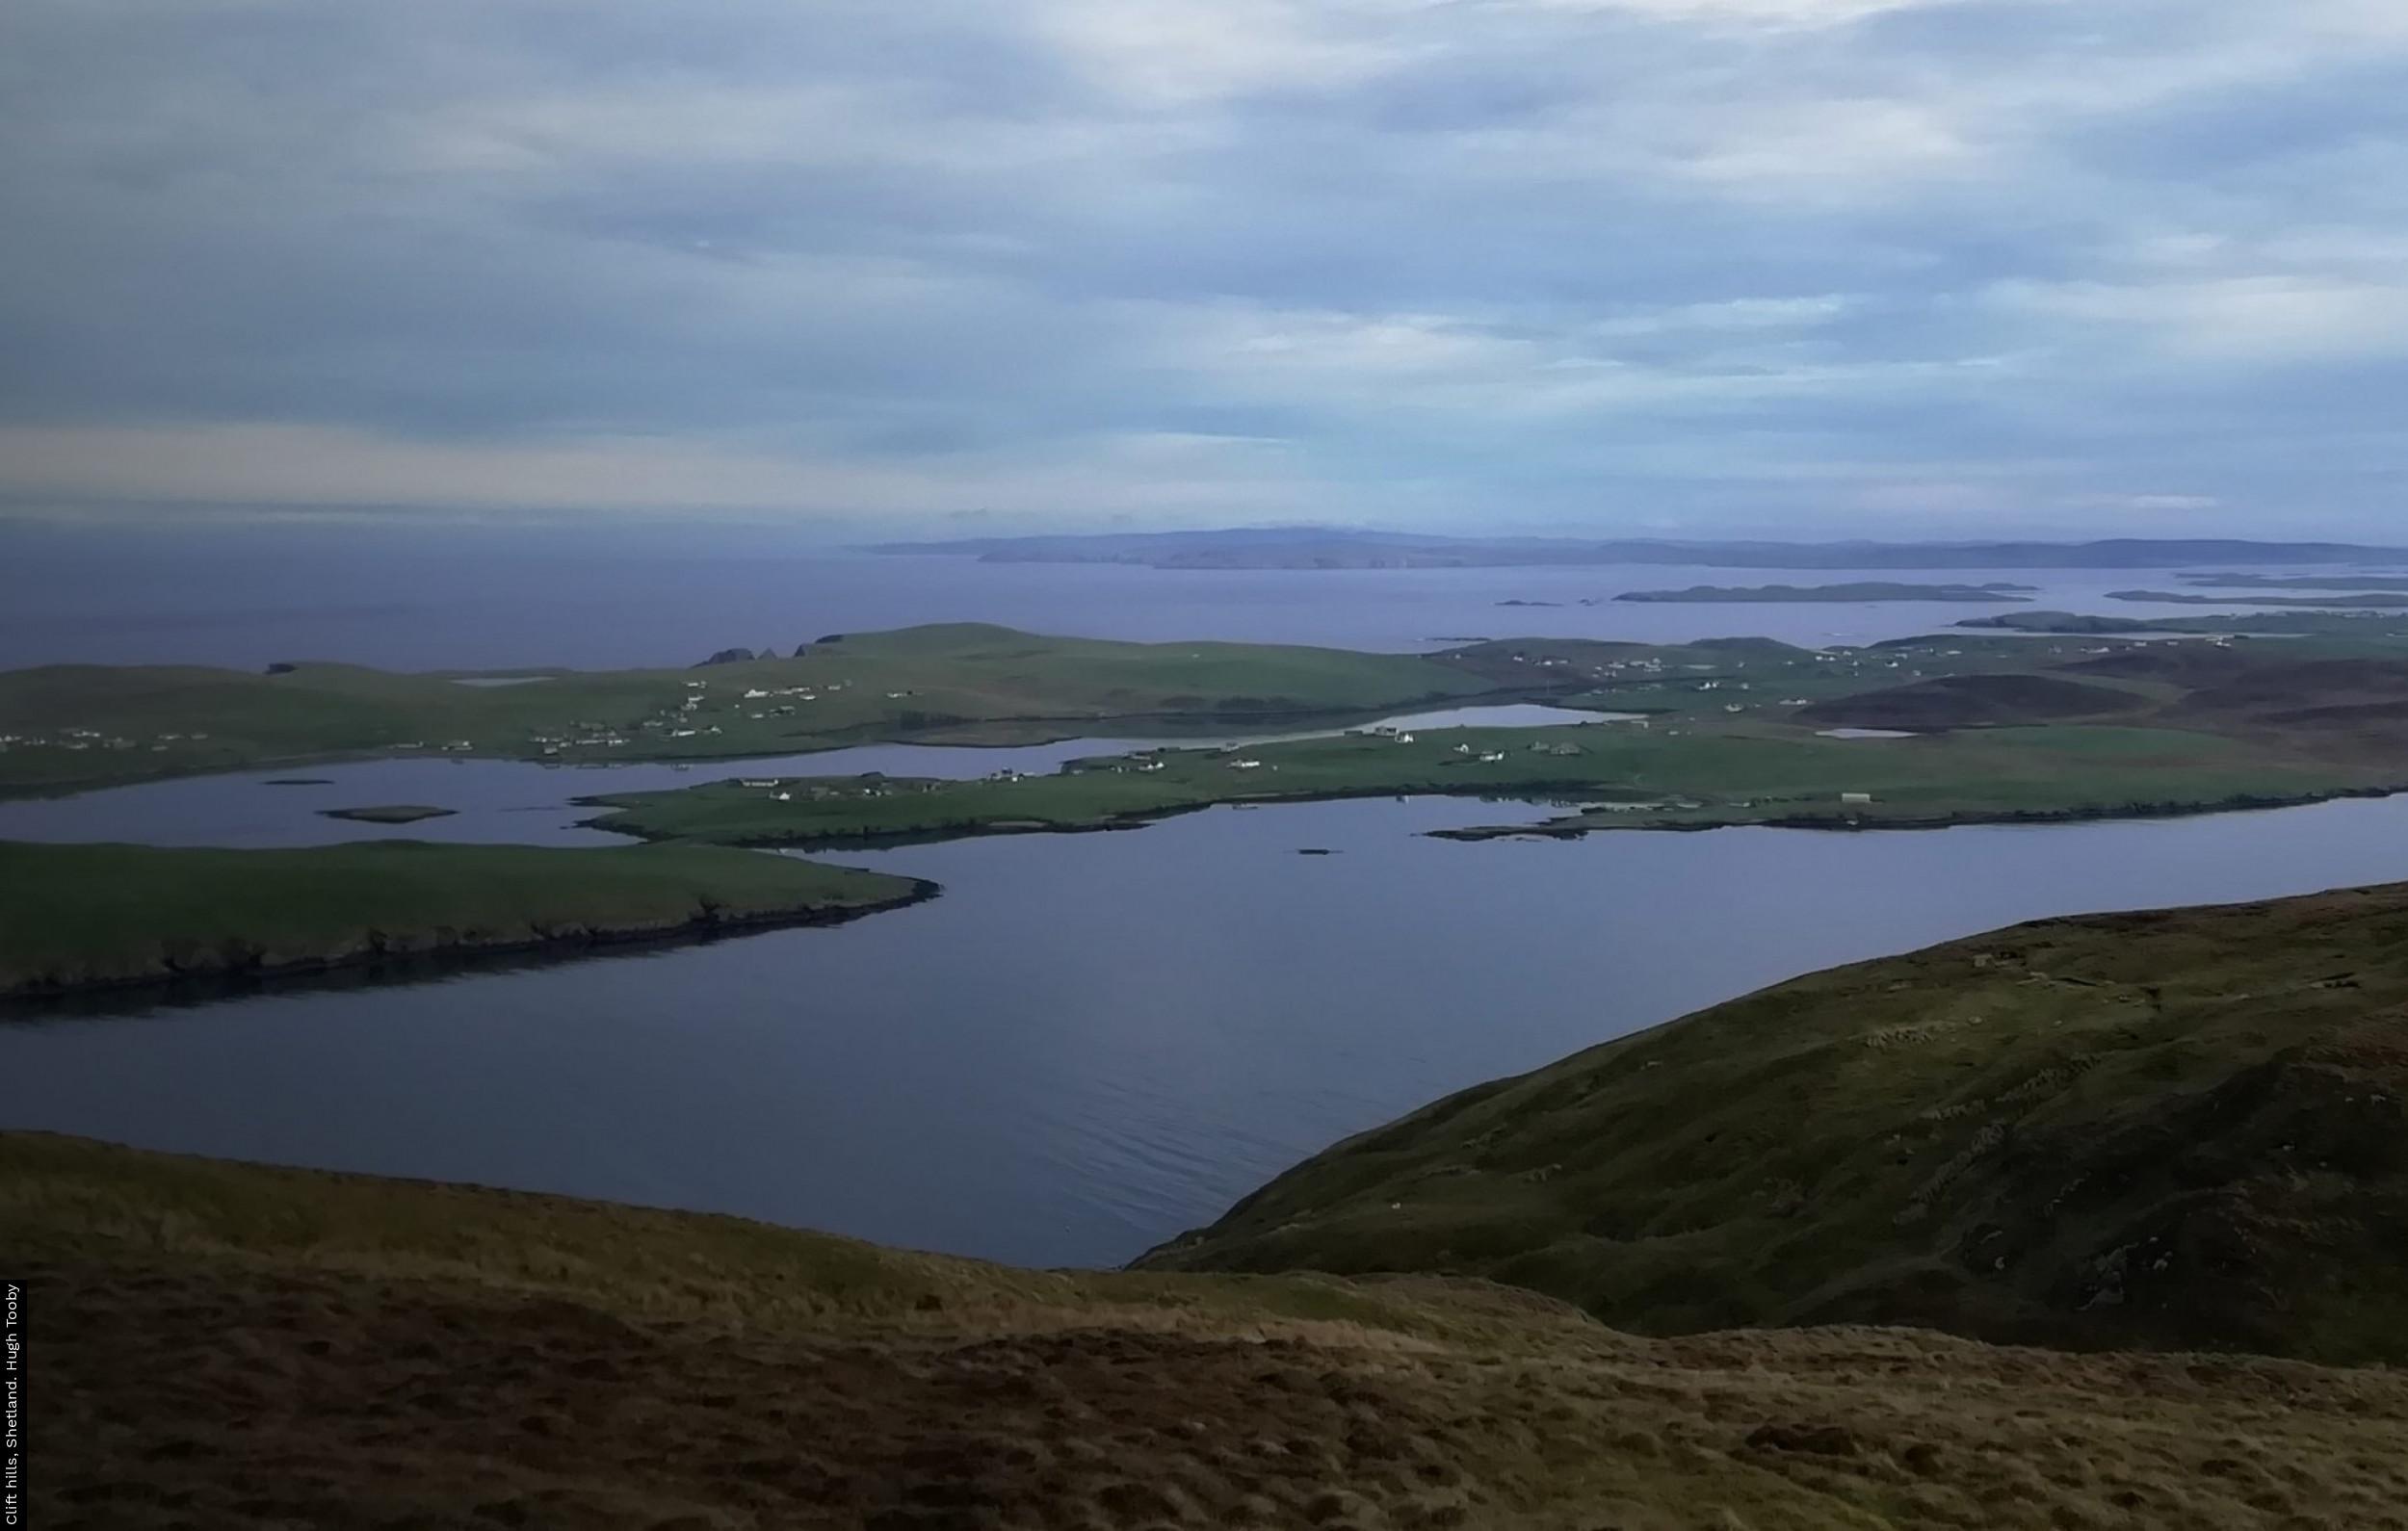 Clift hills, Shetland. Hugh Tooby